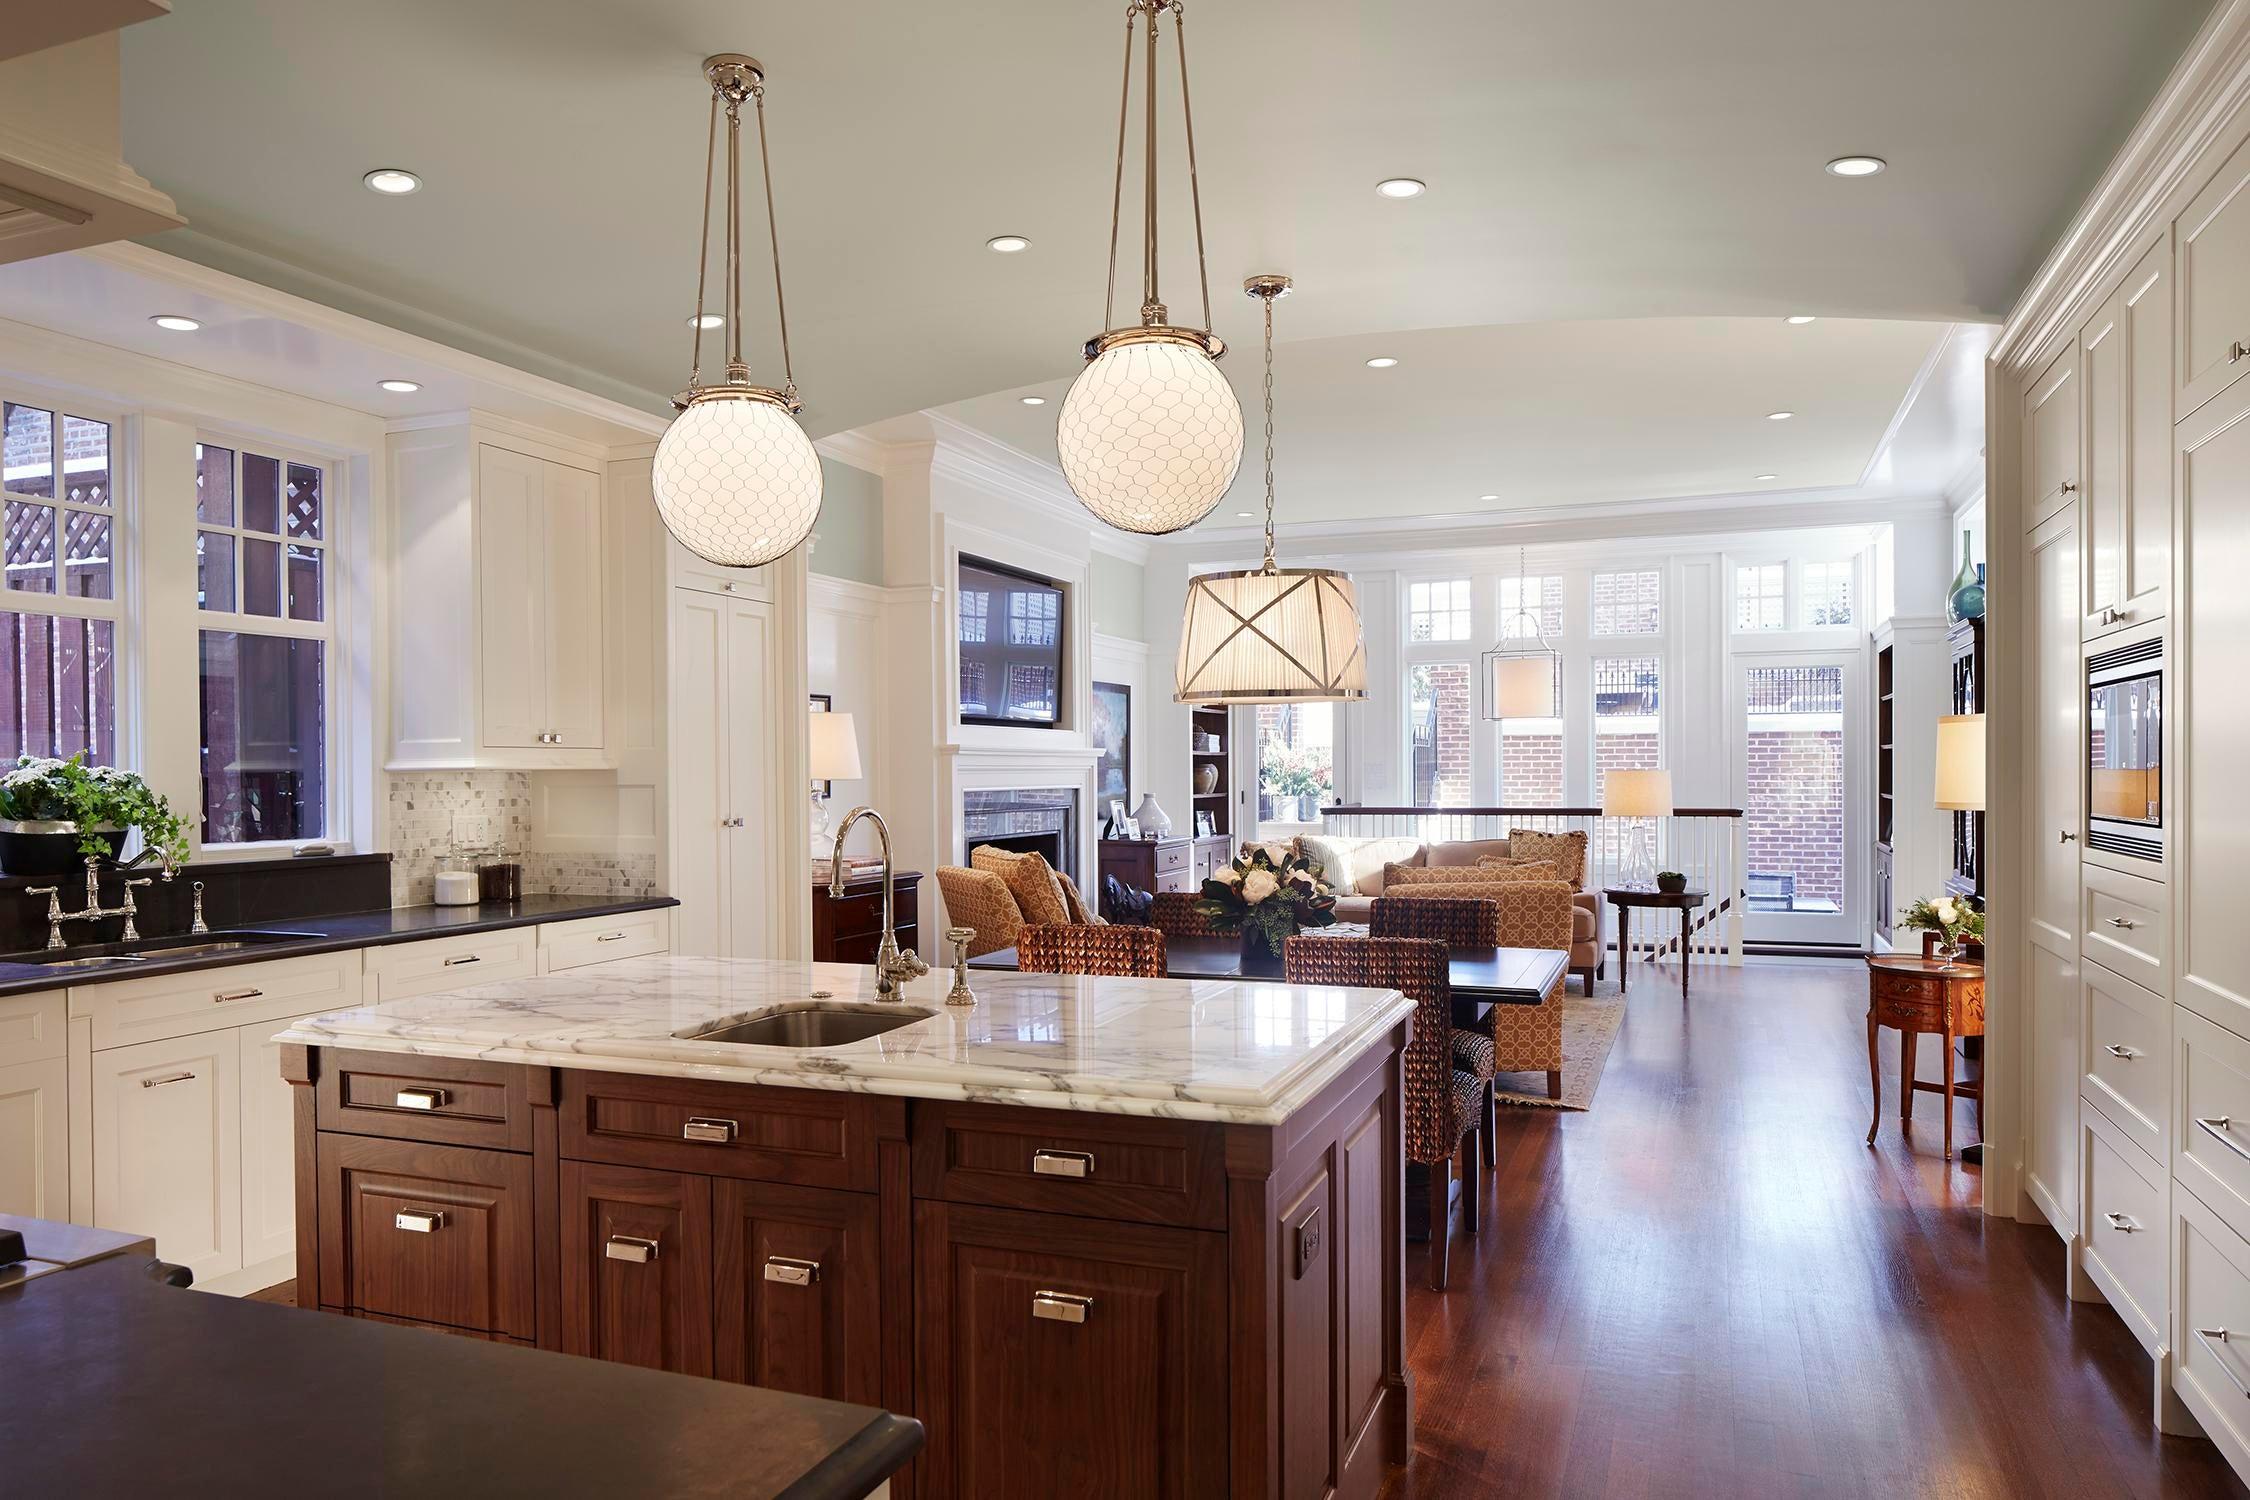 Burns.beyerl.architects.portfolio.interiors.kitchen.family.room.